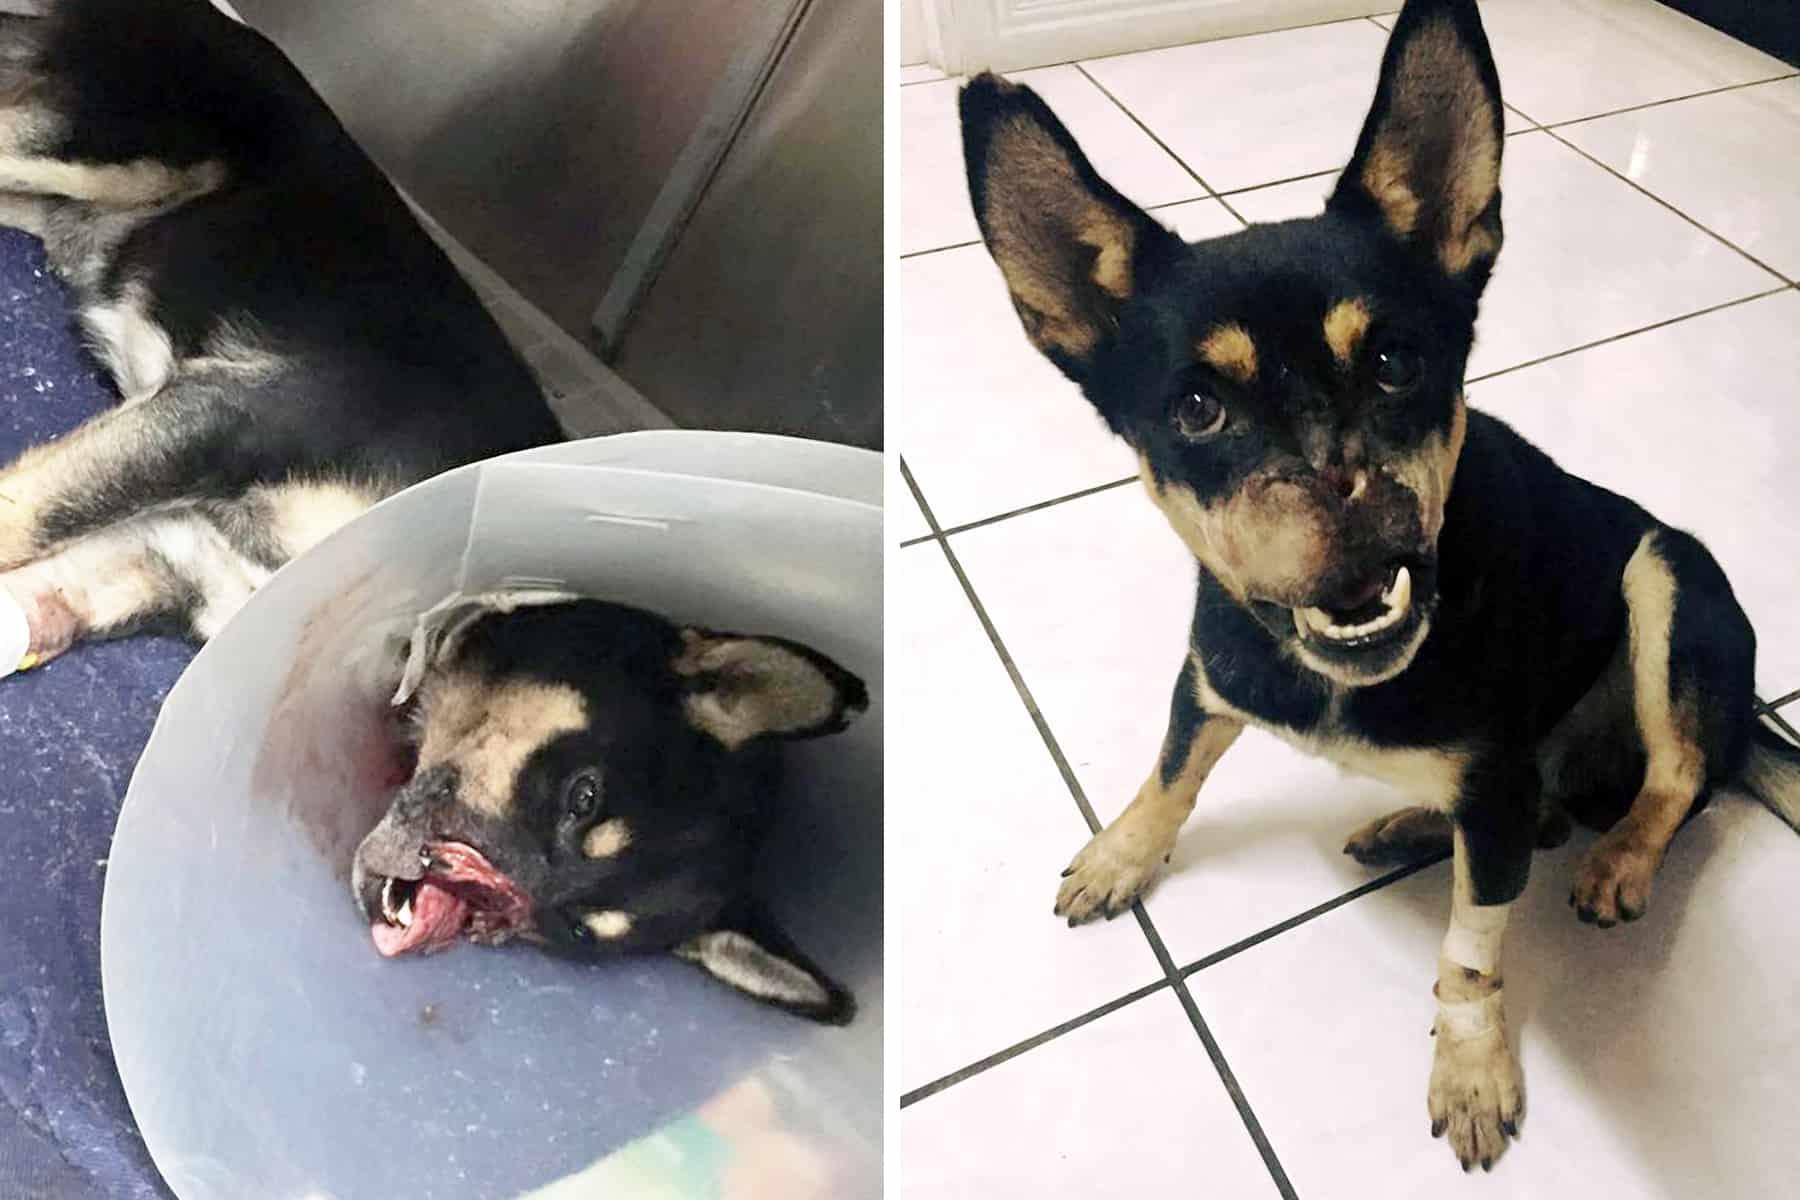 Duke the dog, animal abuse